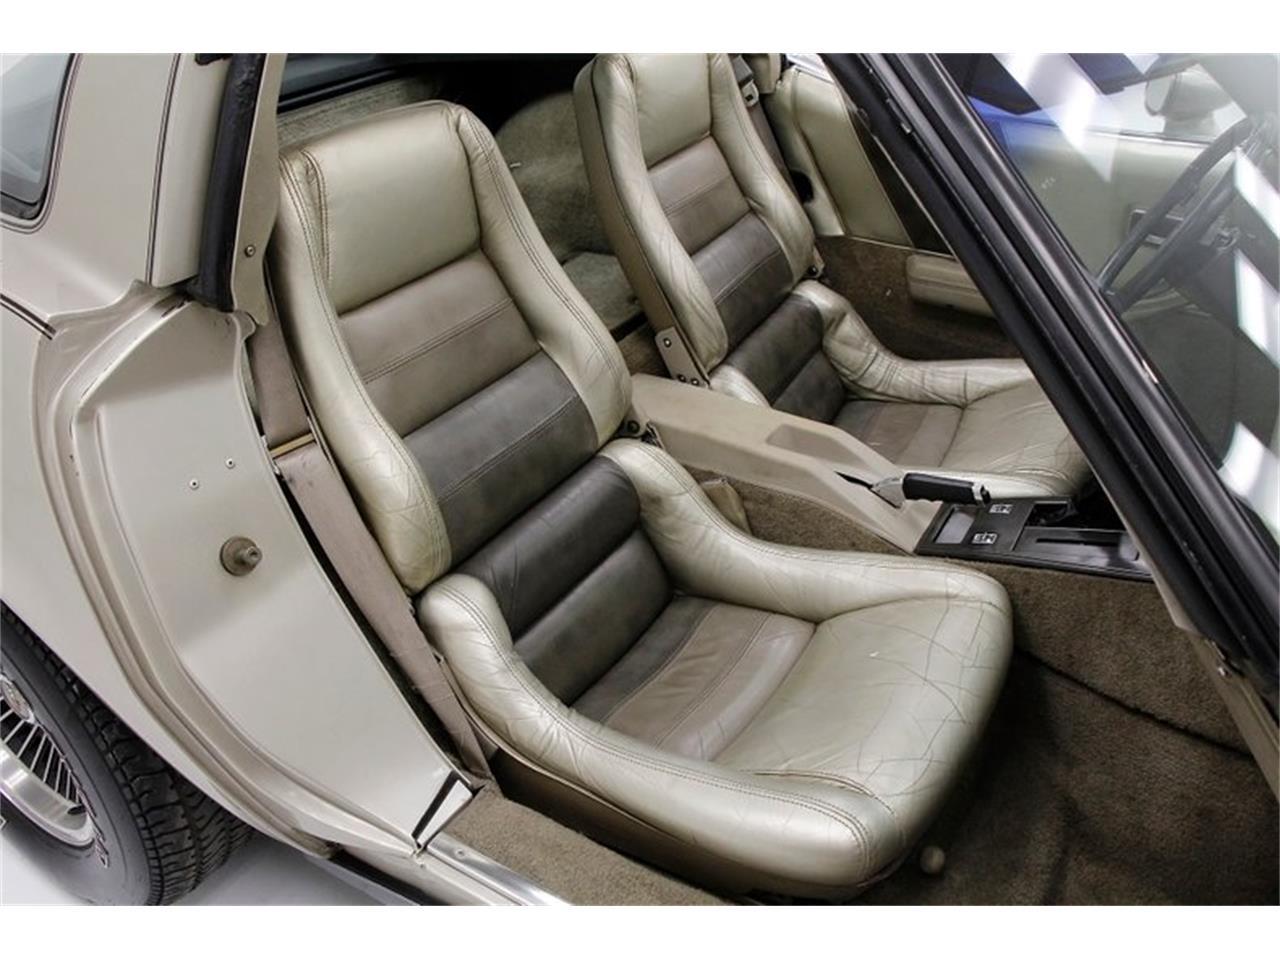 1982 Chevrolet Corvette (CC-1237141) for sale in Morgantown, Pennsylvania